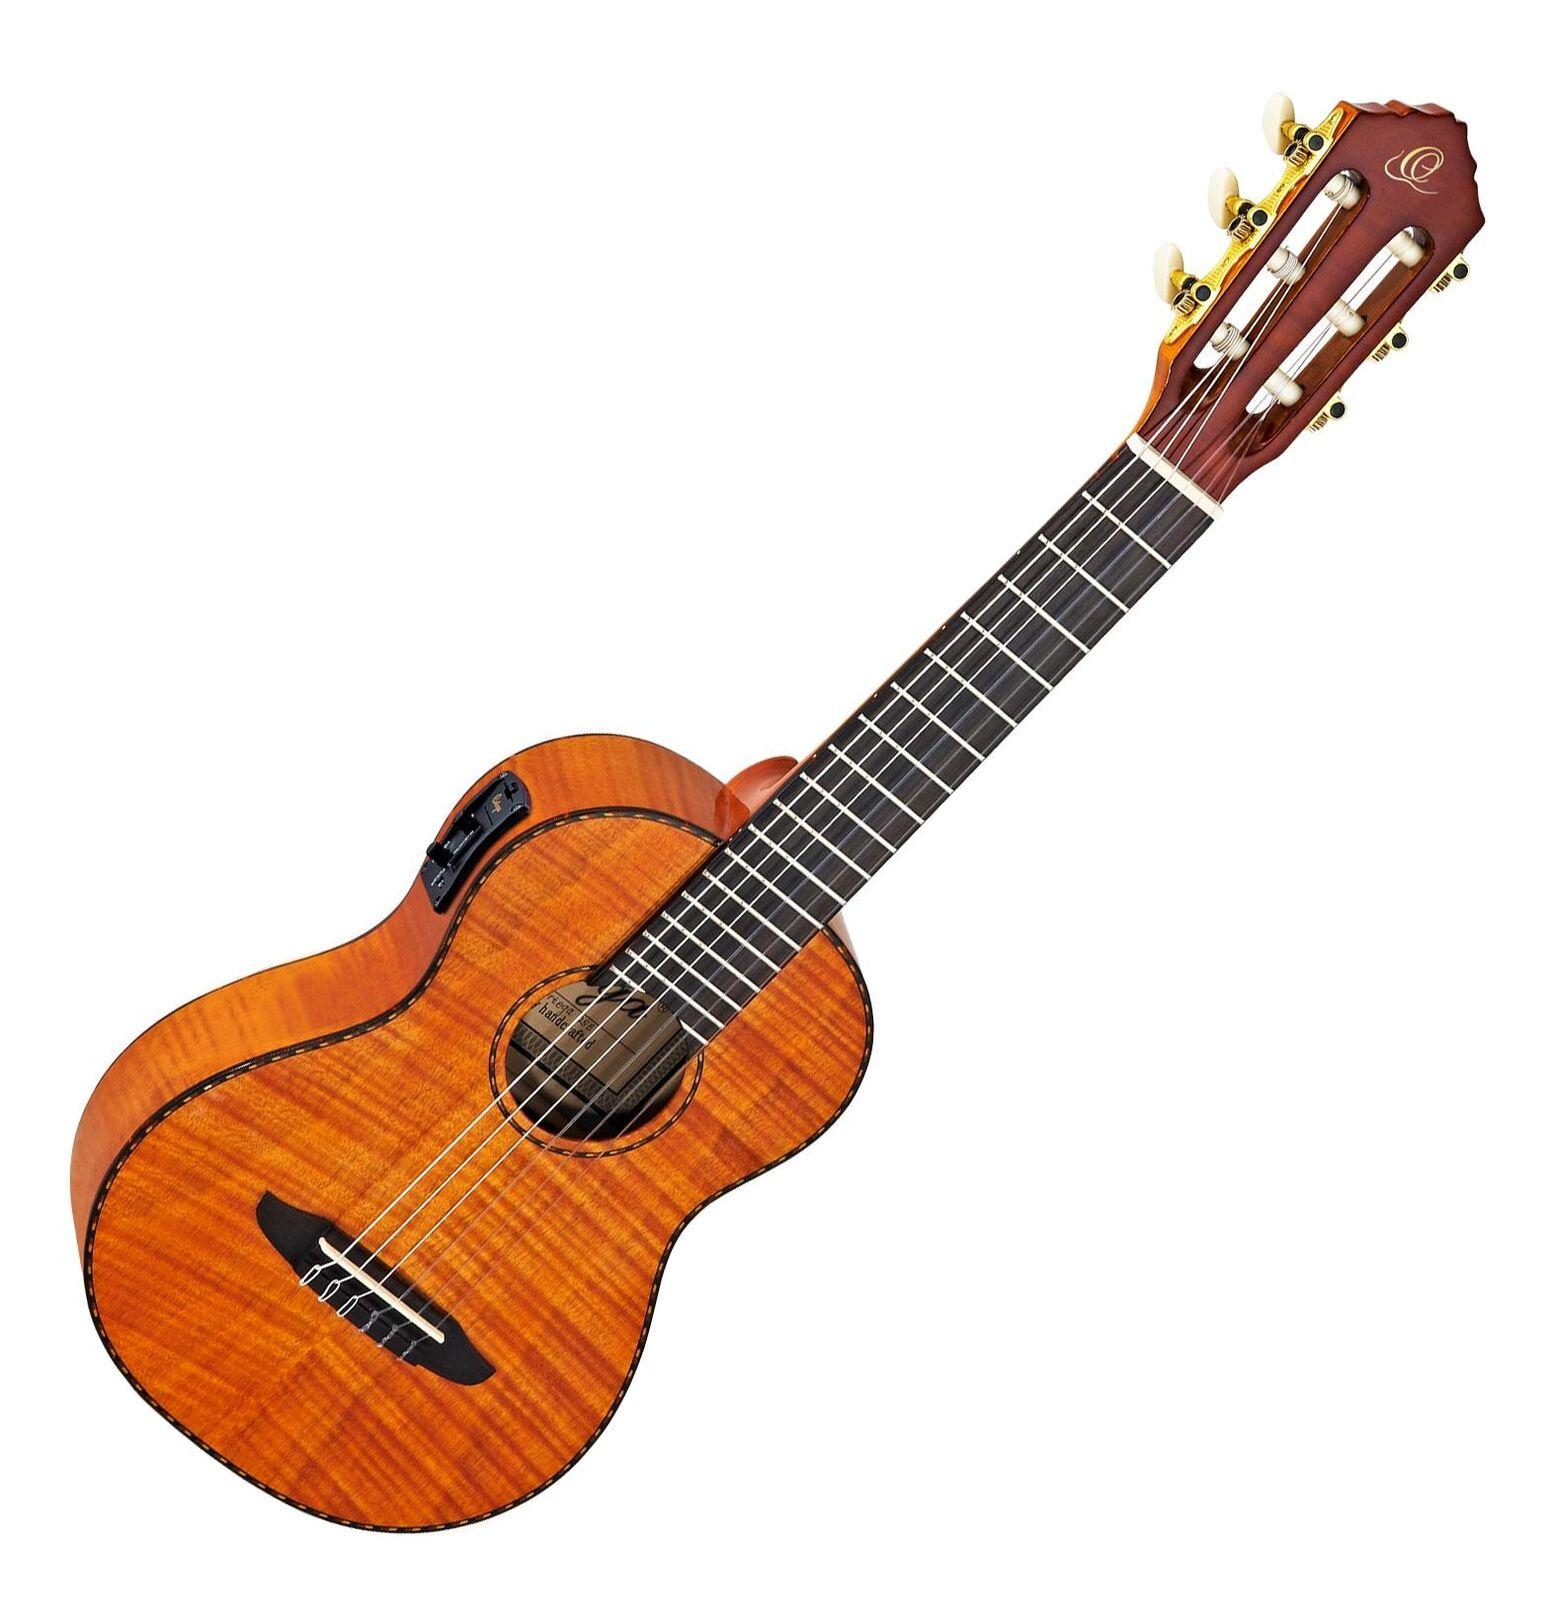 Spitzen Guitarlele von Ortega mit Tonabnehmer inkl. Gigbag aus Mahagoni Natur